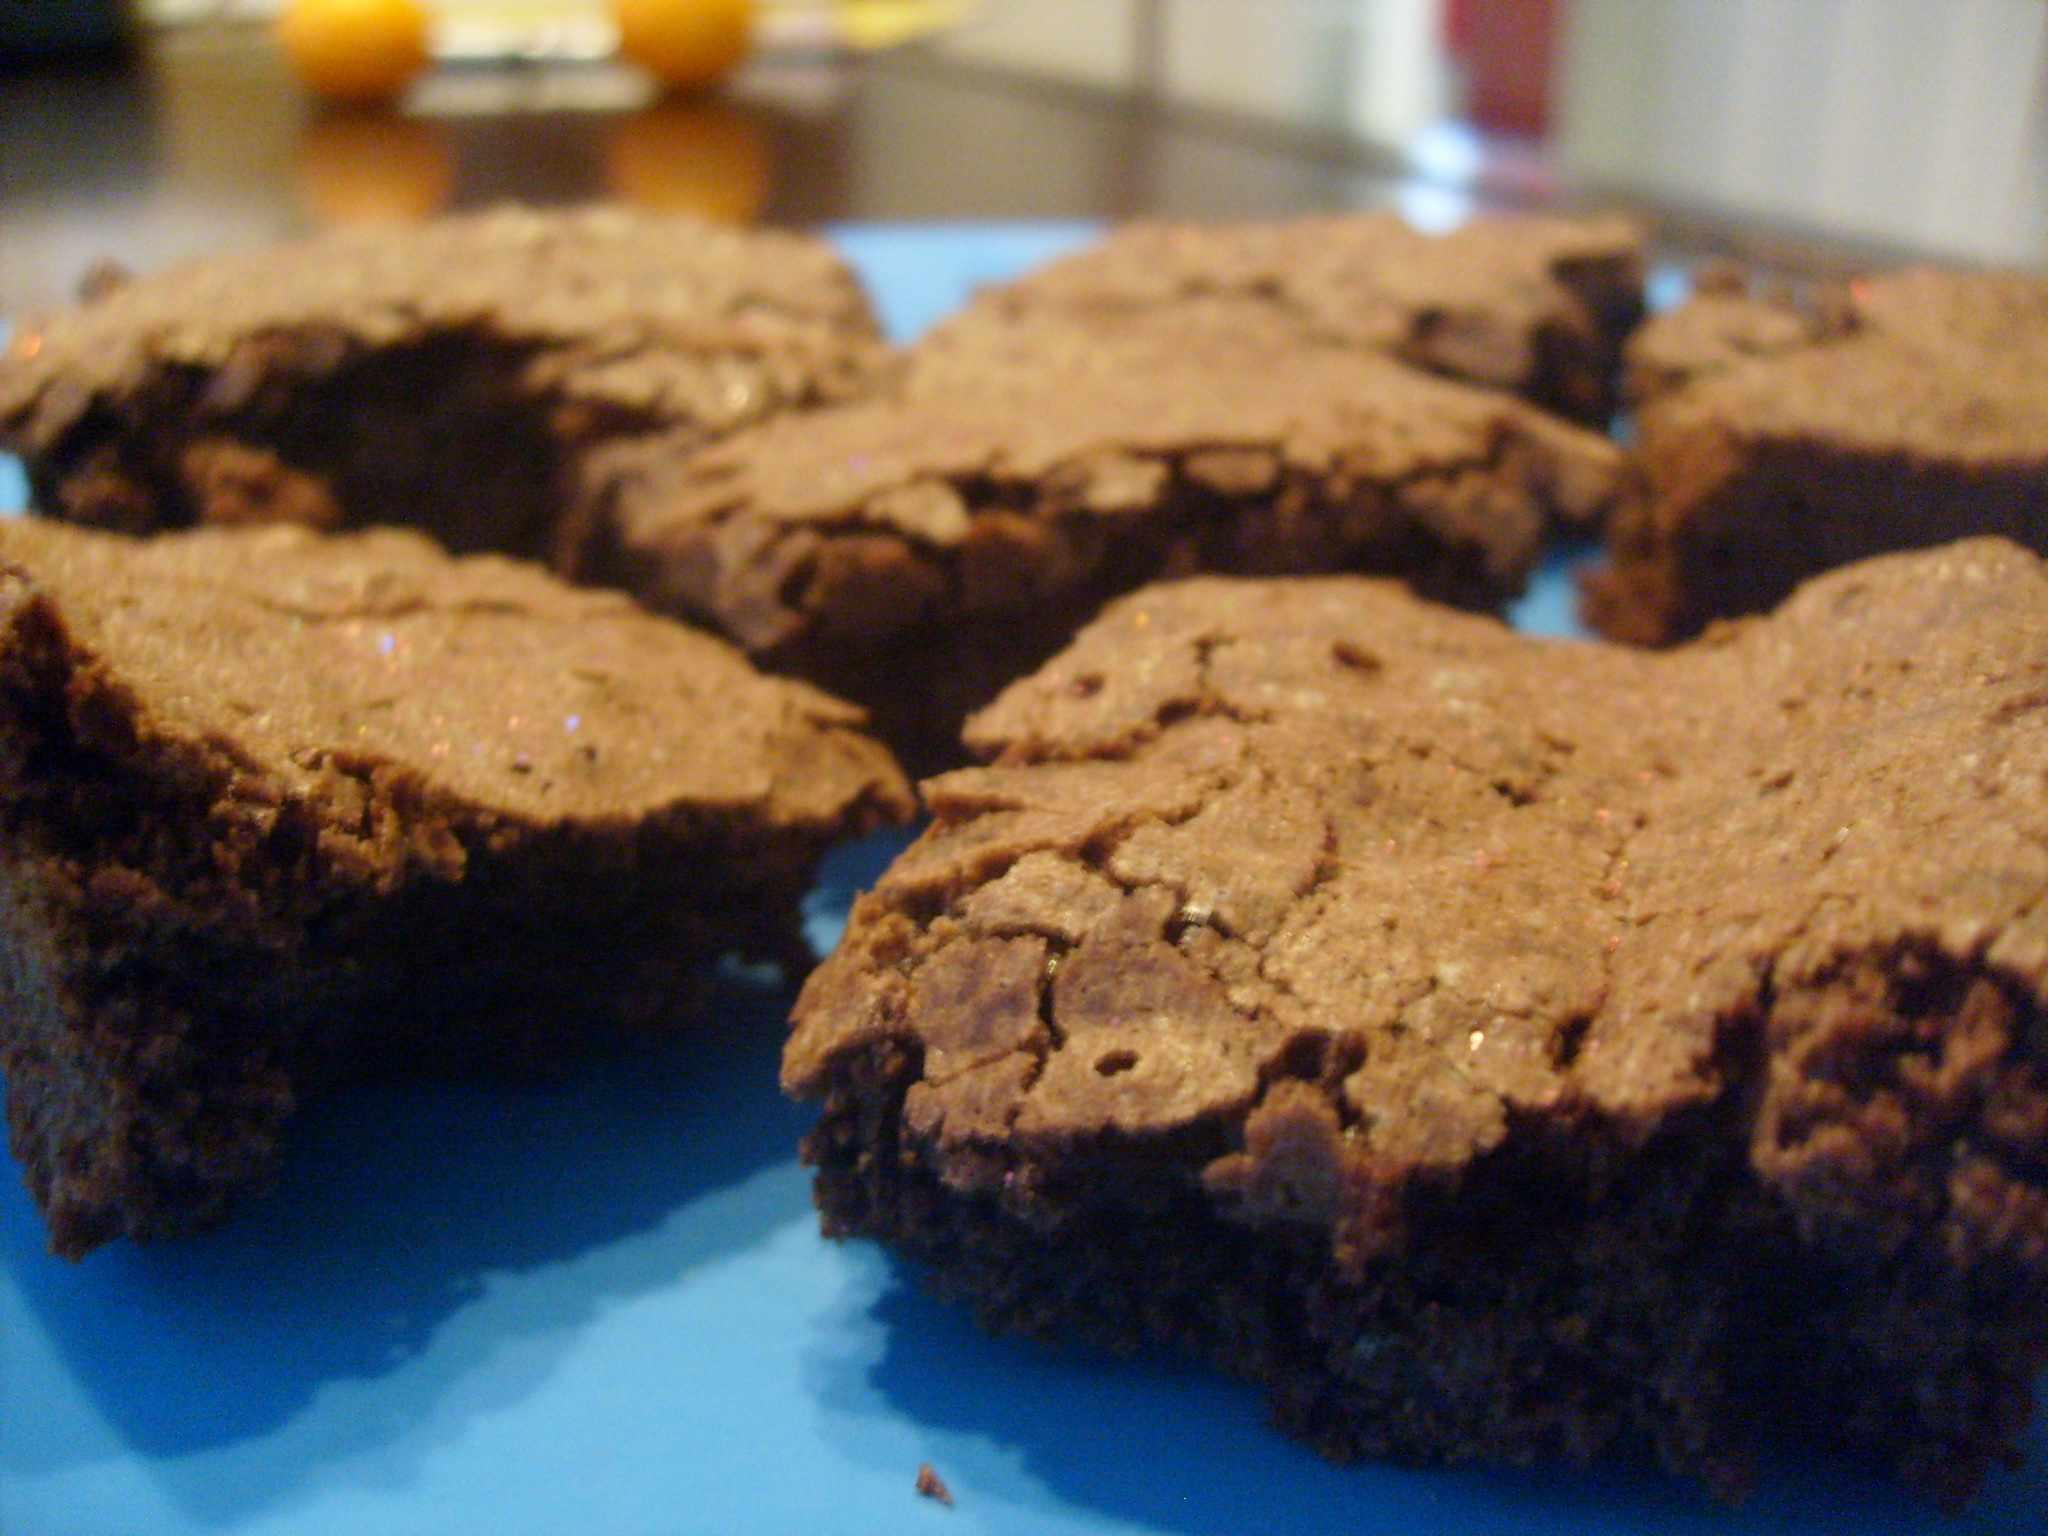 glittery-chocolate-brownies_20655